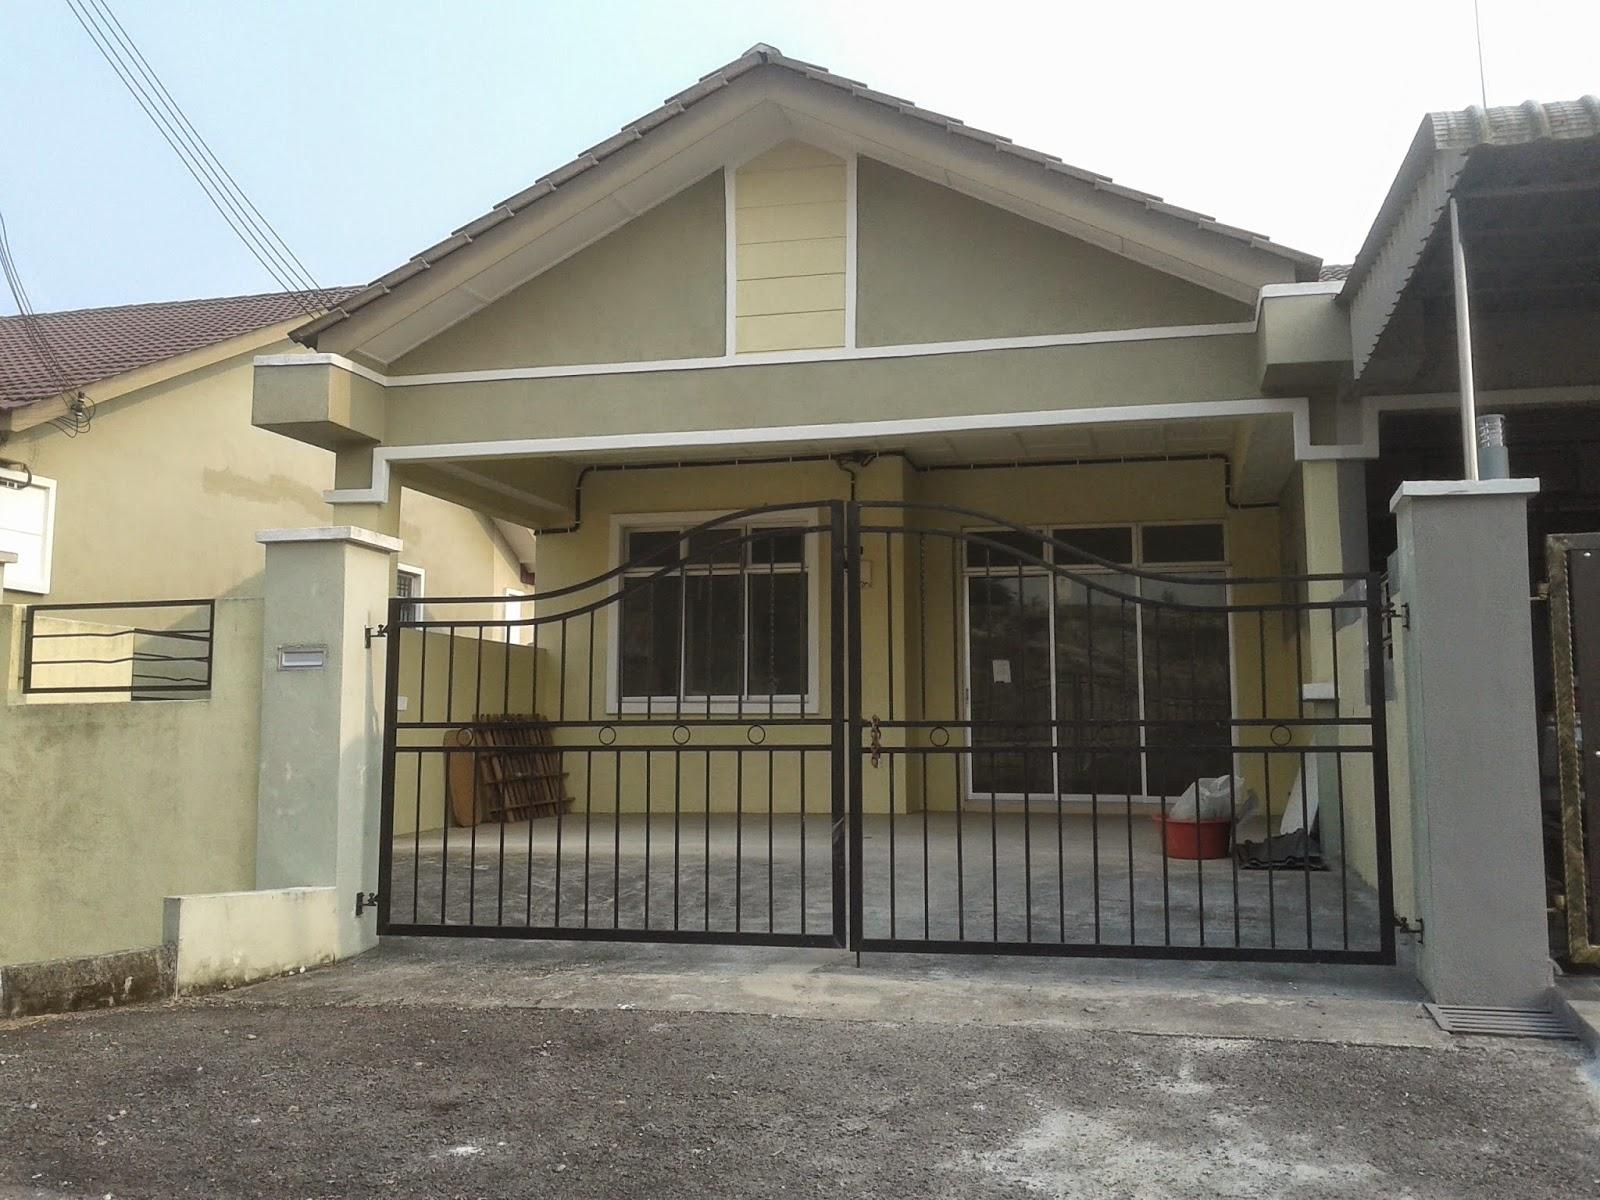 Renovation Rumah Tips Cari Kontraktor Ubah Suai